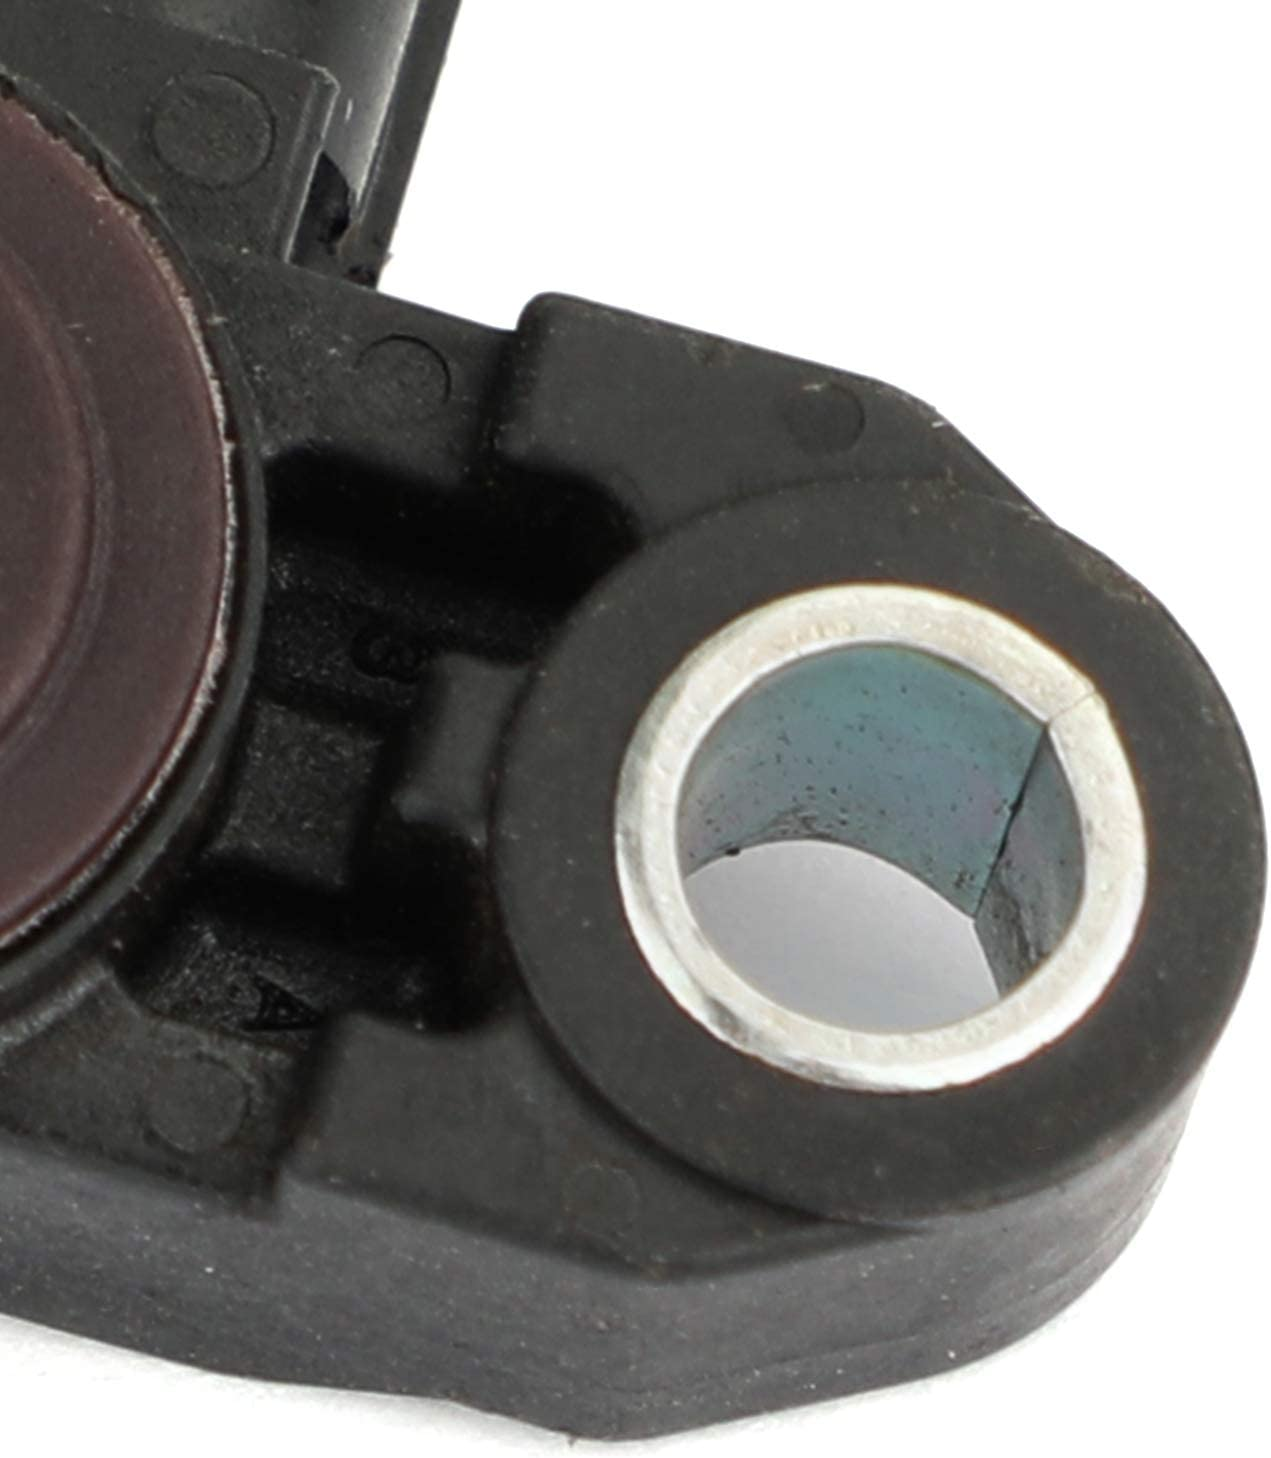 Bruce /& Shark Air Pressure Sensor for Multistrada 1200 Panigale 899 959 1199 Diavel 55241571A